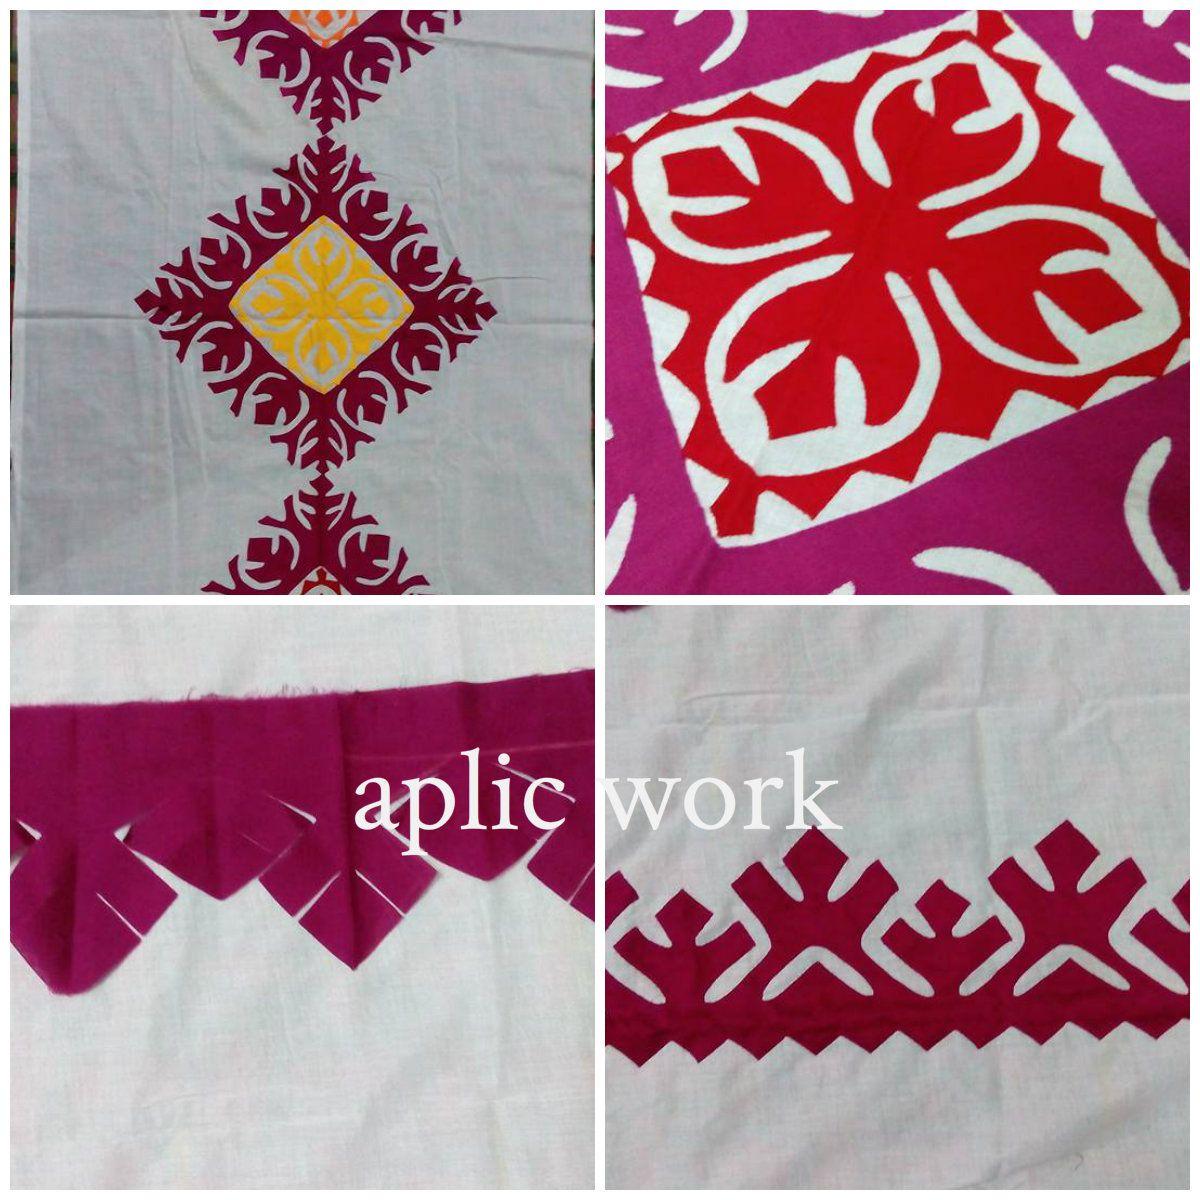 Ribbon work bed sheets designs - Aplic Work